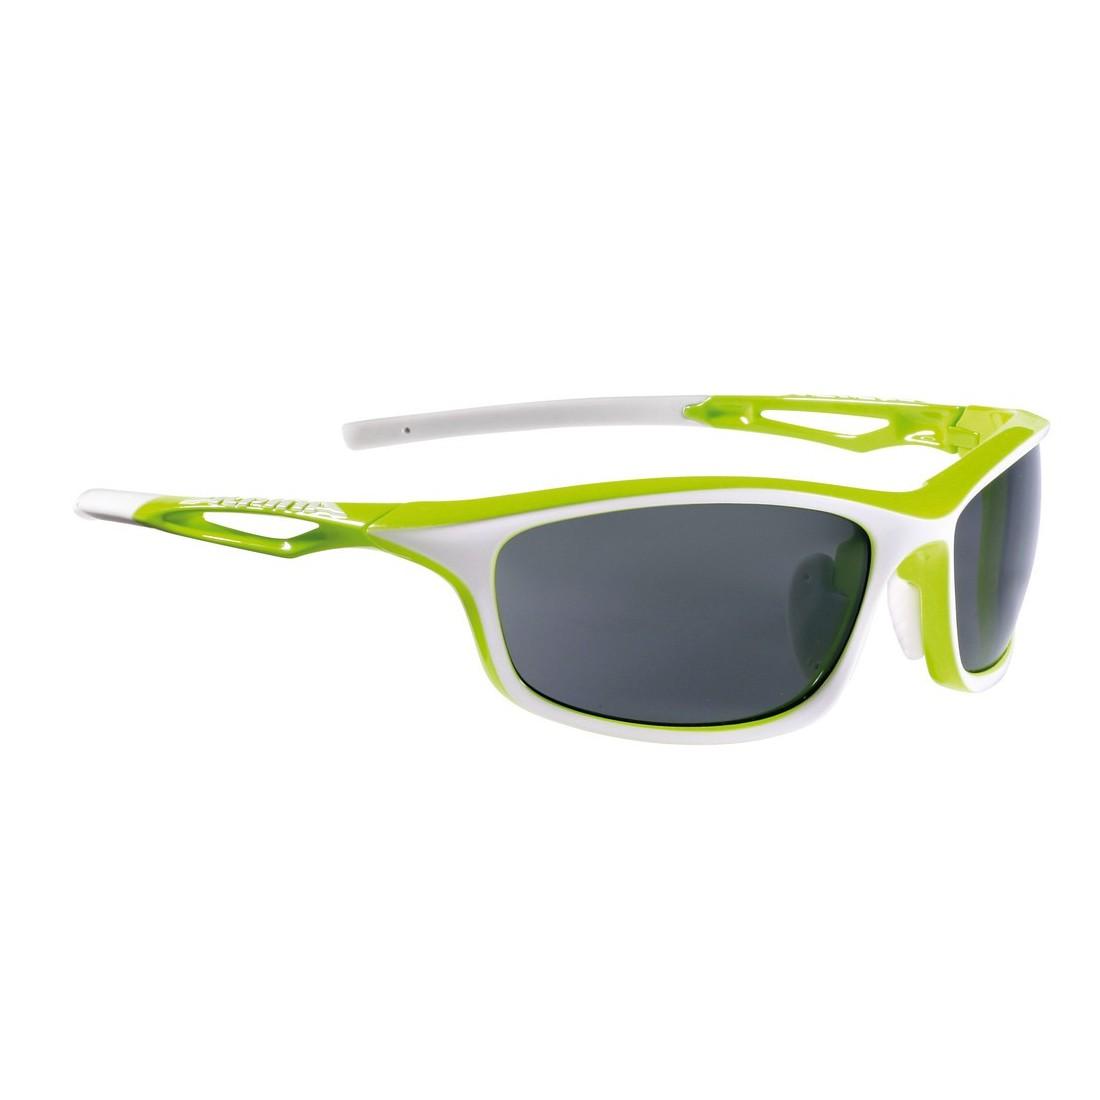 ALPINA A8569471 Sonnenbrille Sorcery, Rahmen grün/weiß matt, Glas S3 ...